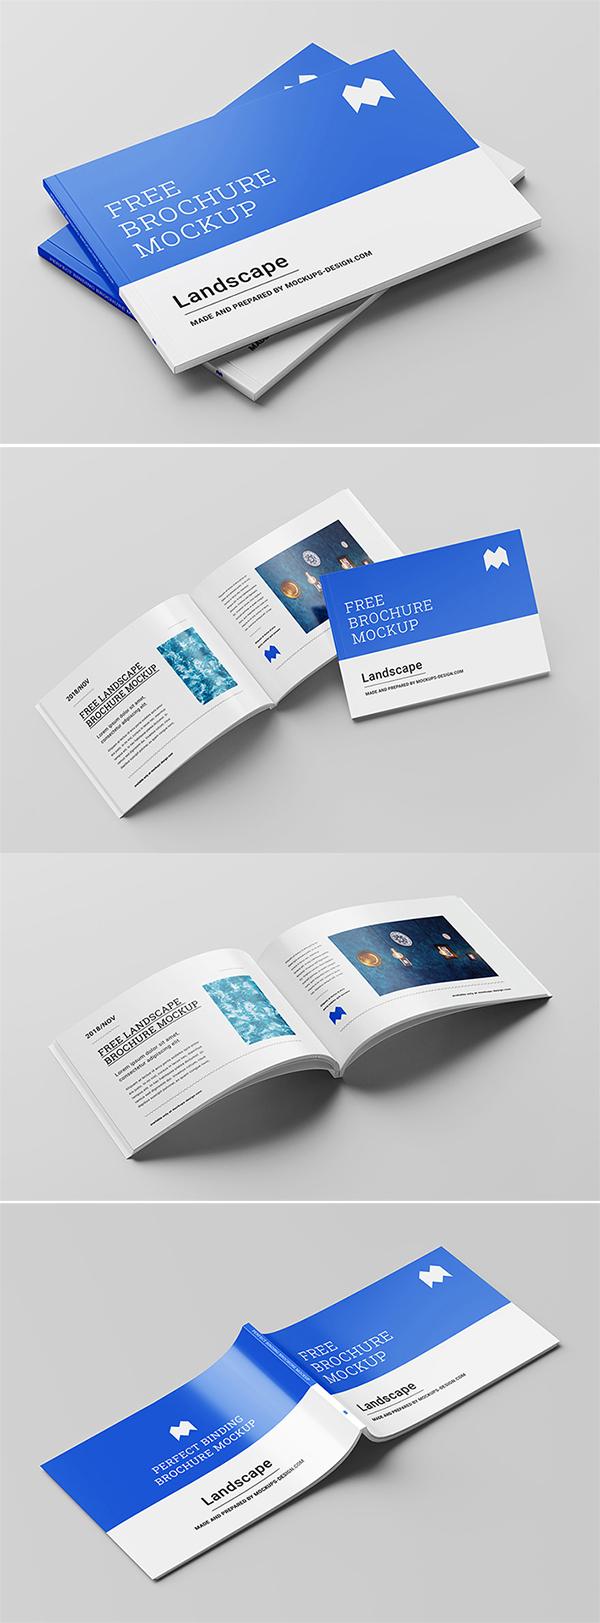 Free Download Perfect Landscape Brochure PSD Mockup